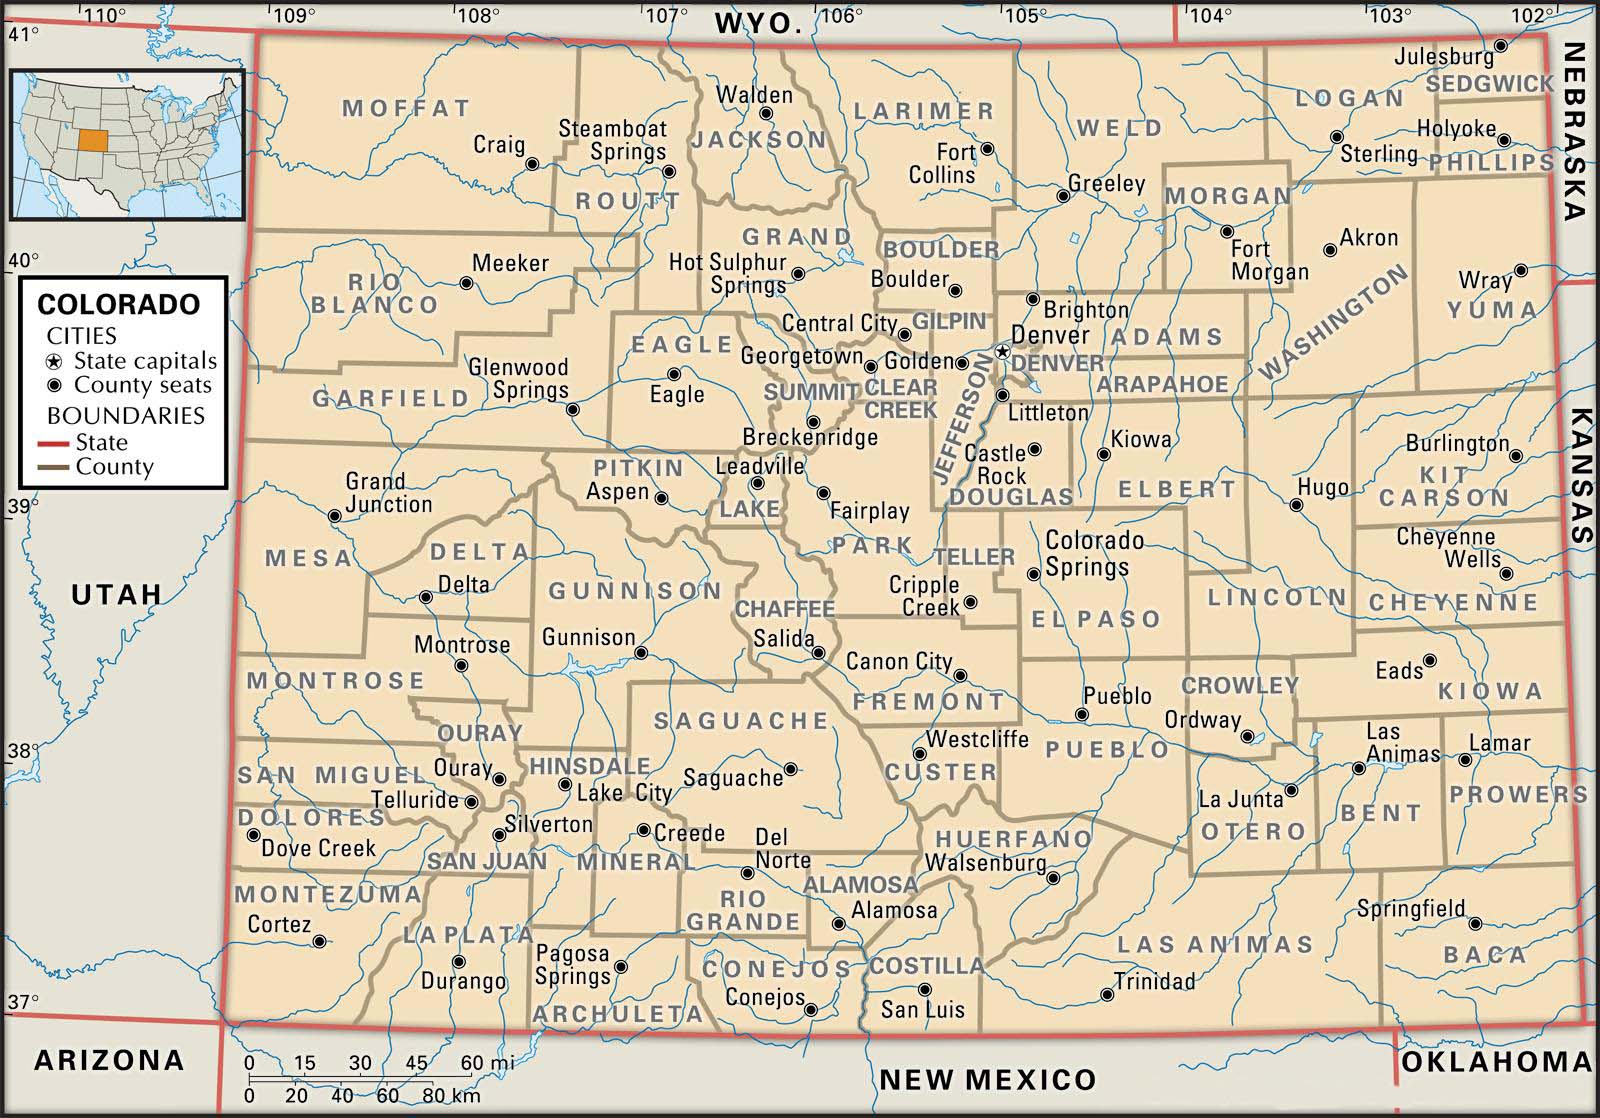 MAP OF COLORADO | Metro Map